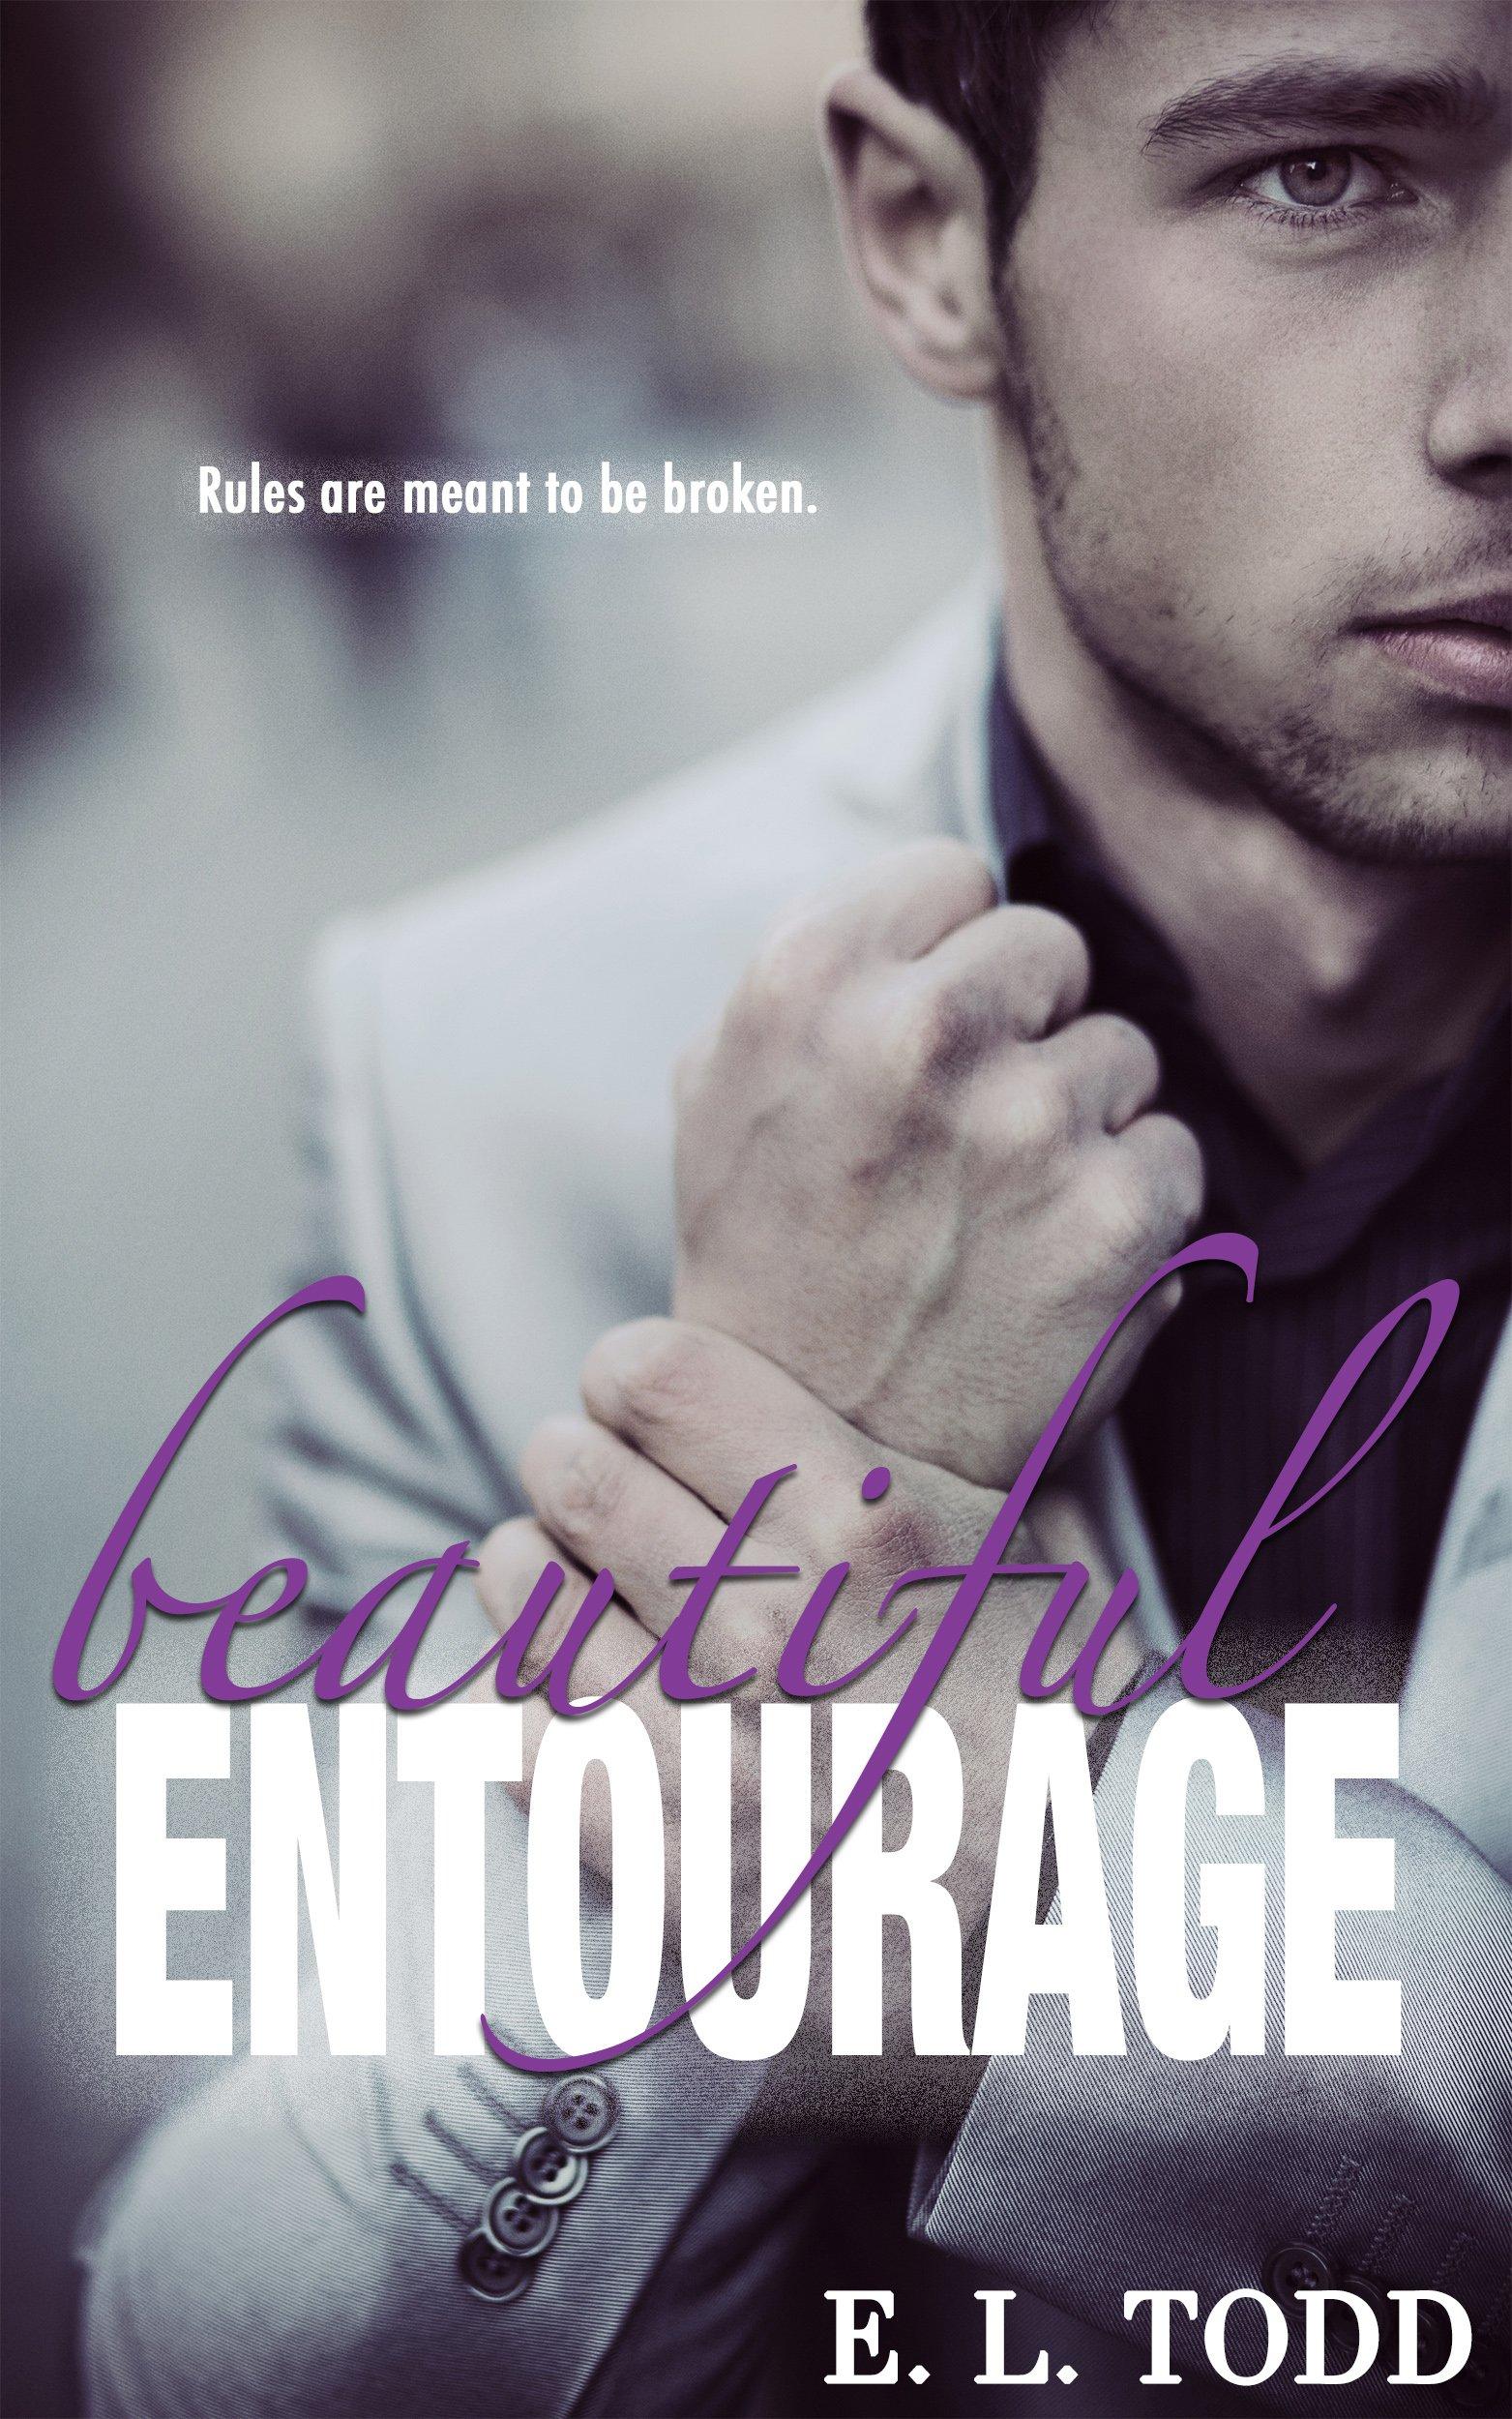 Novel Of The Week: Beautiful Entourage by E.L.Tood